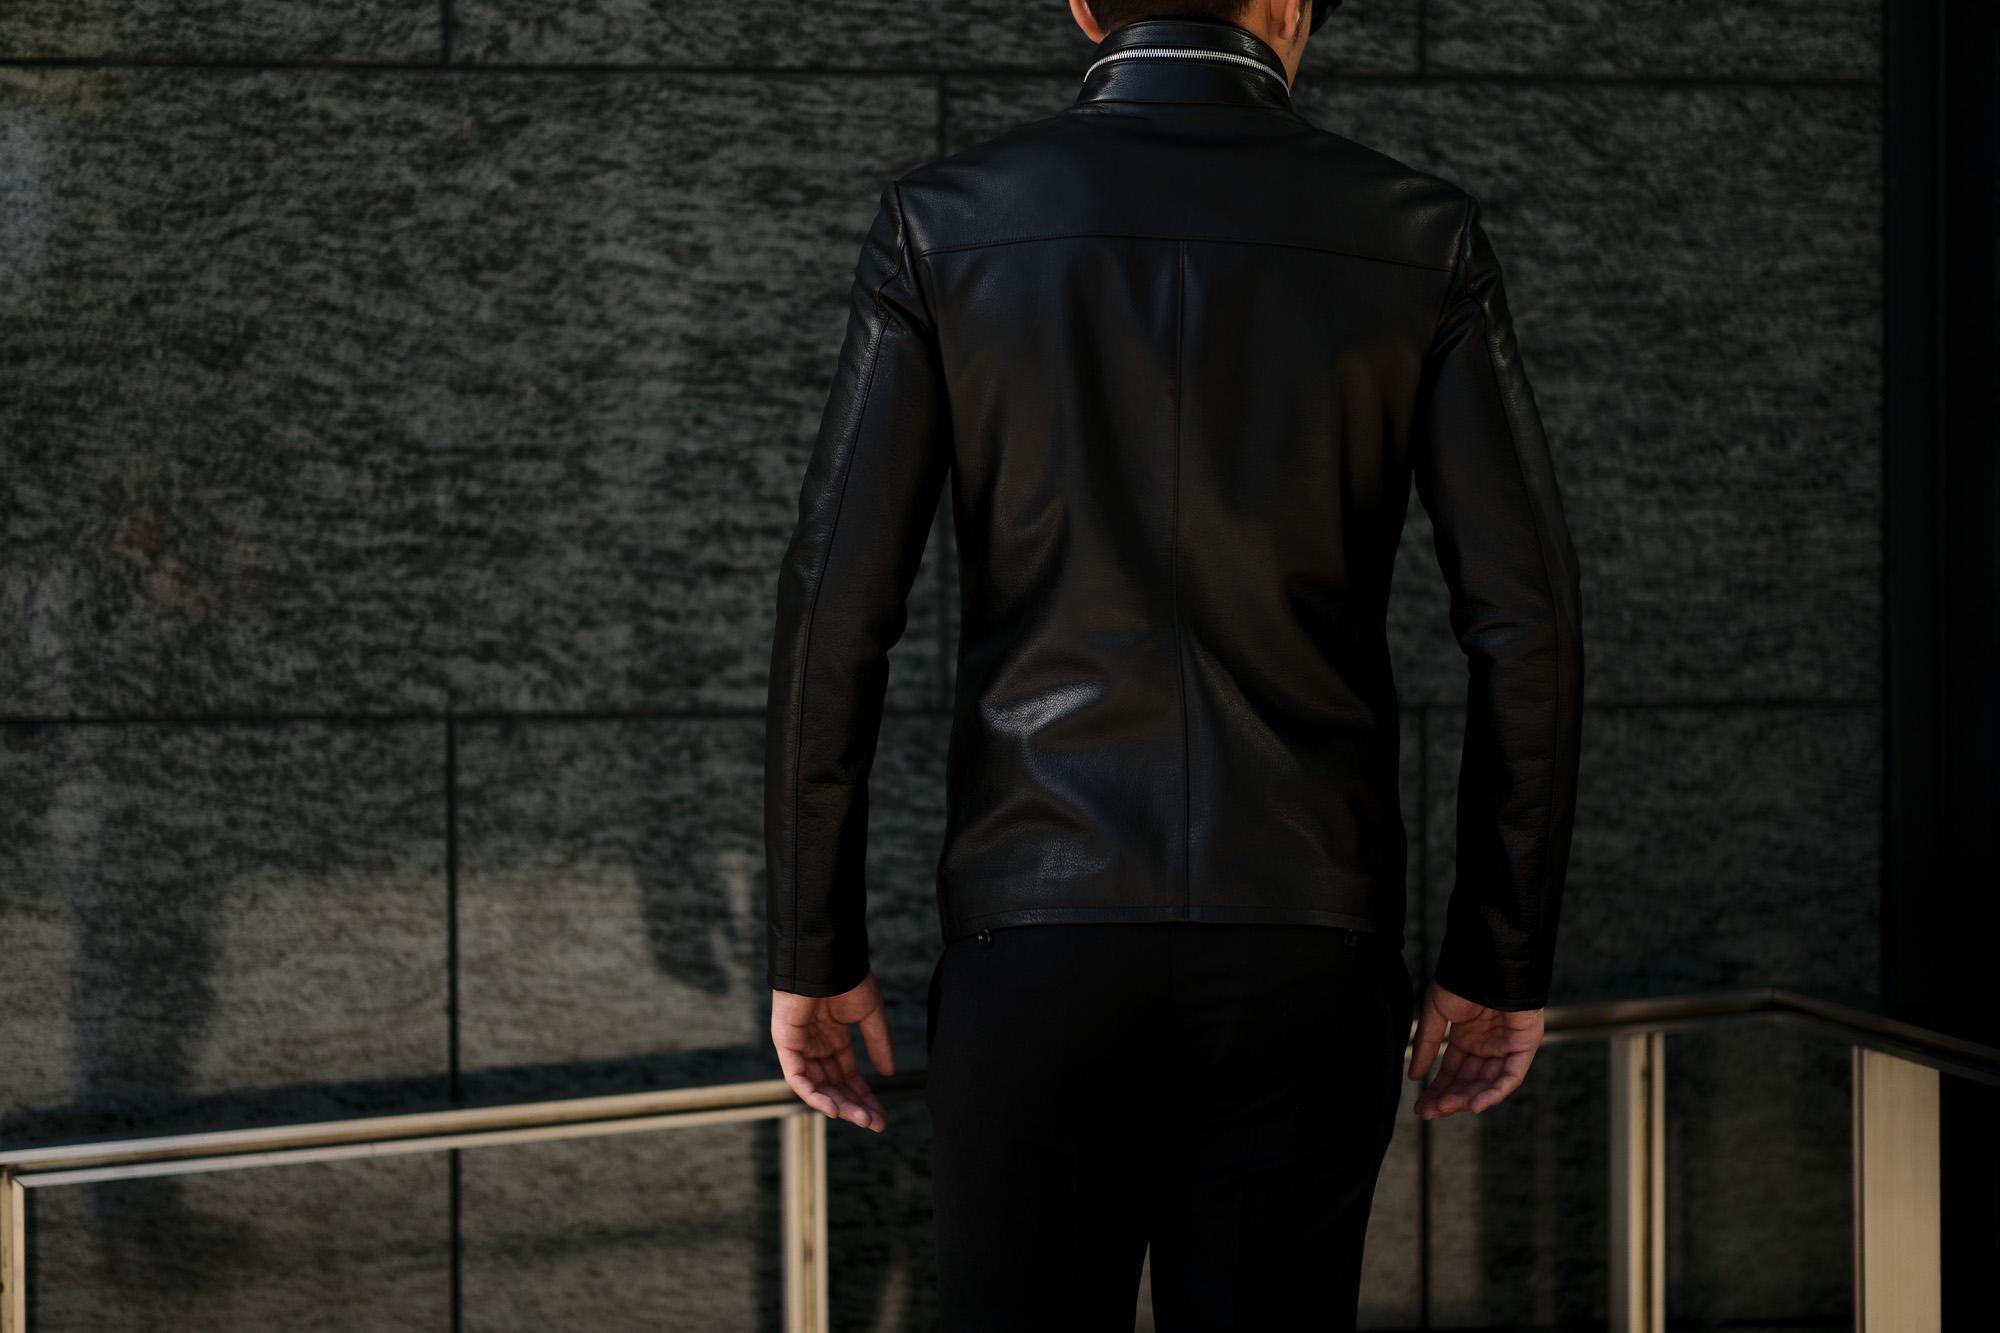 Cuervo (クエルボ) Satisfaction Leather Collection (サティスファクション レザー コレクション) HUNK(ハンク) BUFFALO LEATHER (バッファロー レザー) レザージャケット BLACK(ブラック) MADE IN JAPAN (日本製) 2019 秋冬 【ご予約受付中】 愛知 名古屋 altoediritto アルトエデリット バイオハザード ハンク バイオ BIOHAZARD